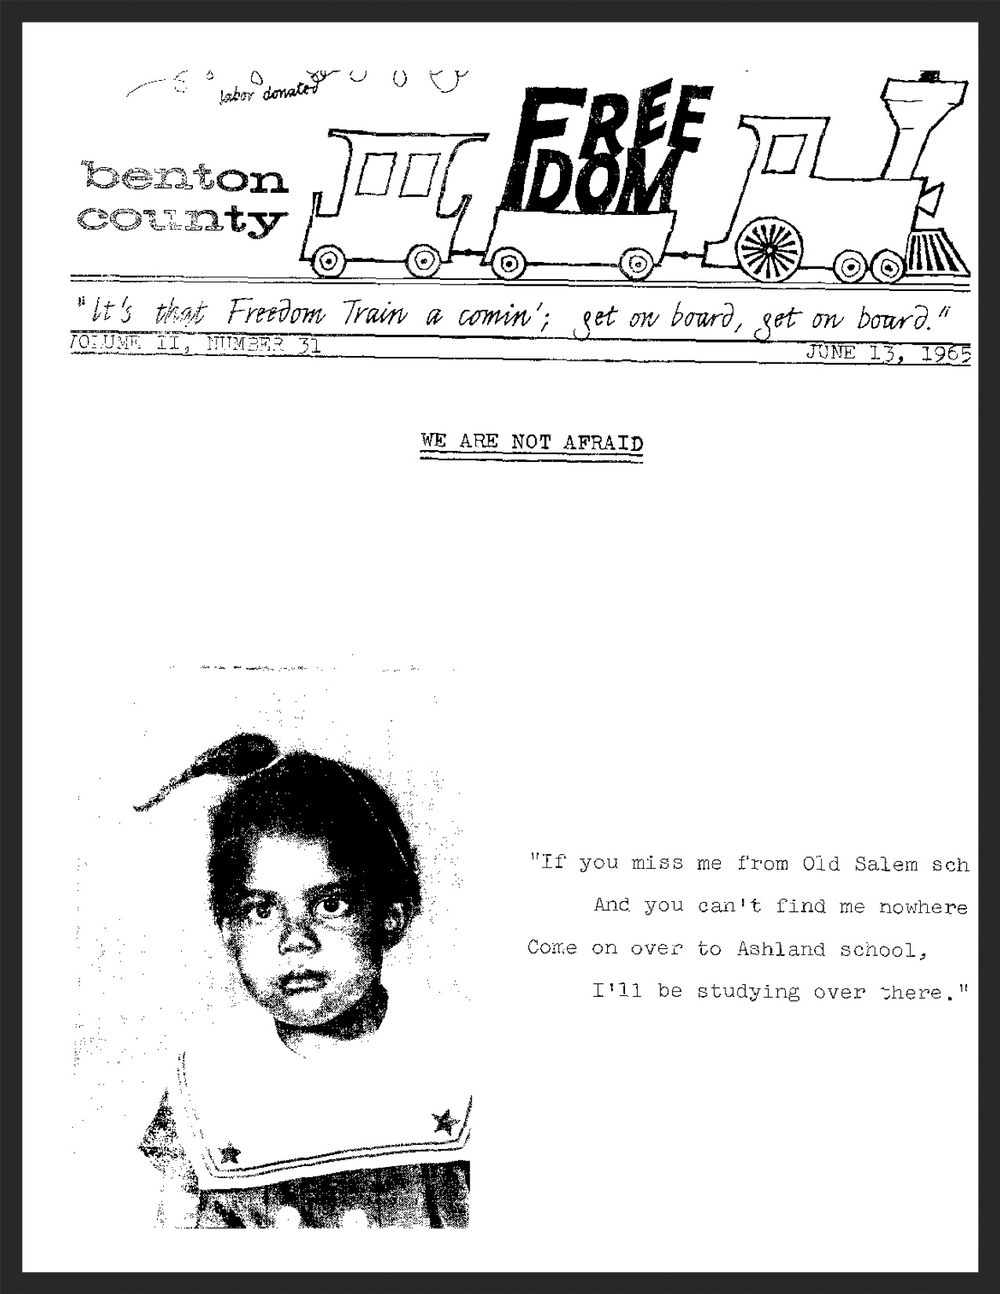 June 13, 1965